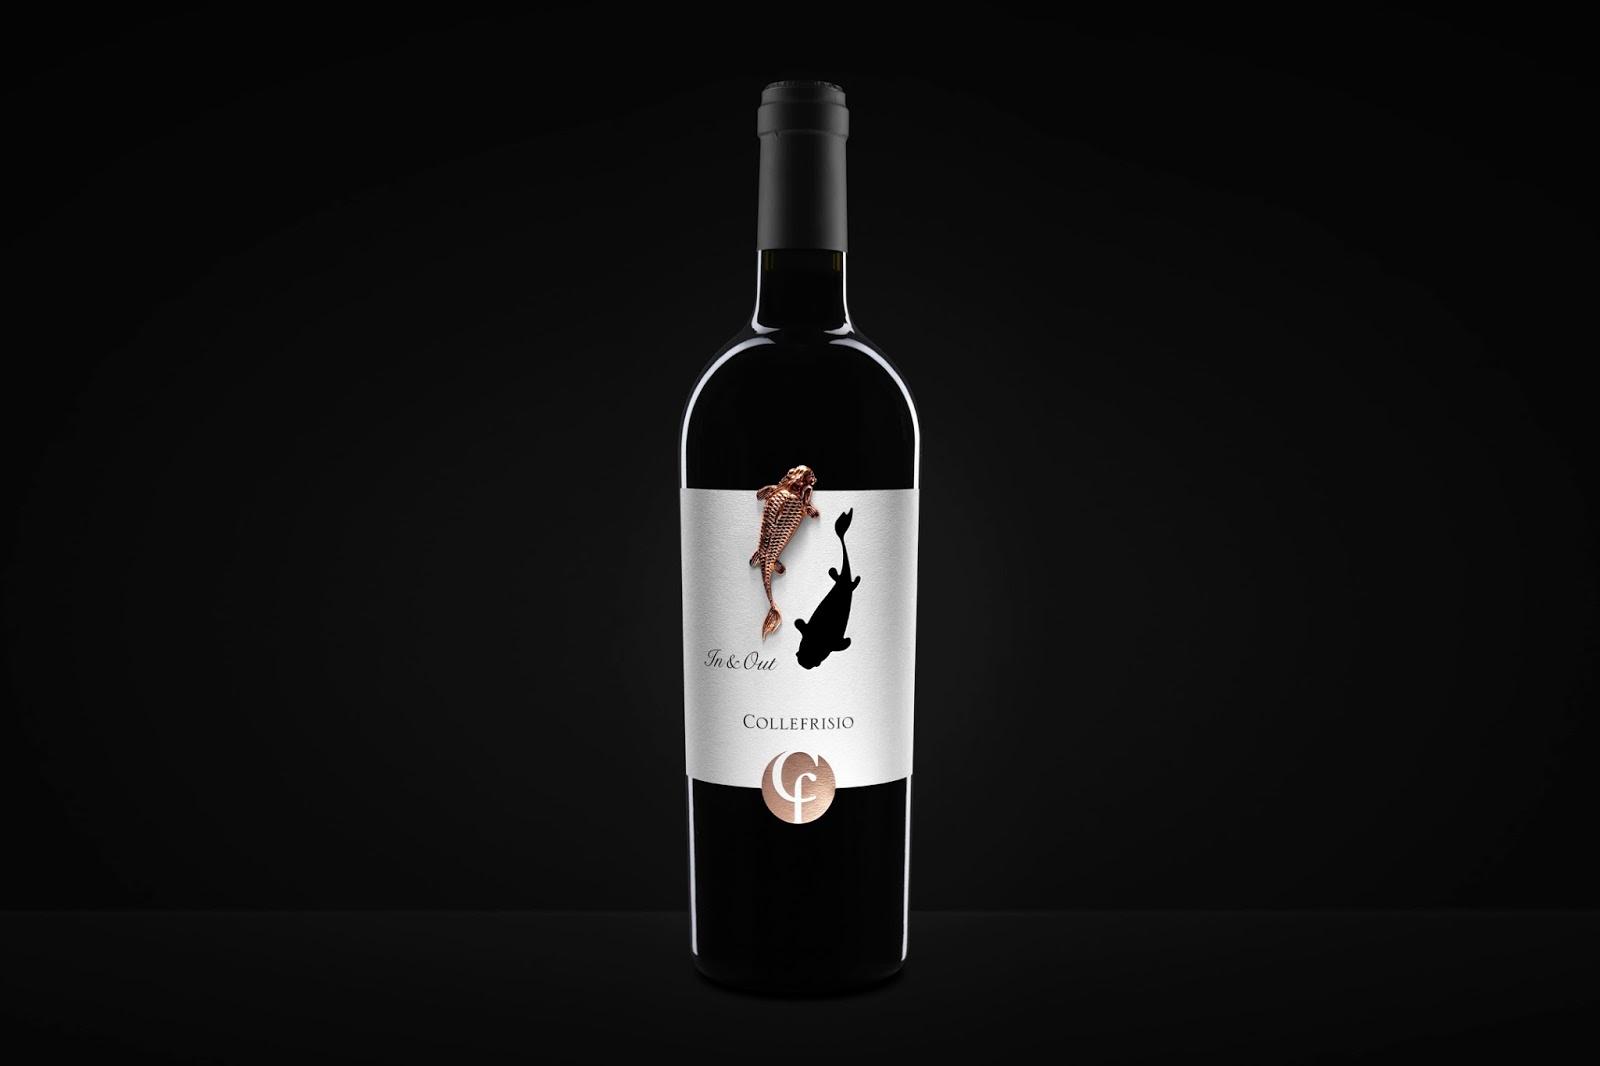 collefrisio spazio di paolo mario packaging wine vinitaly italy 2